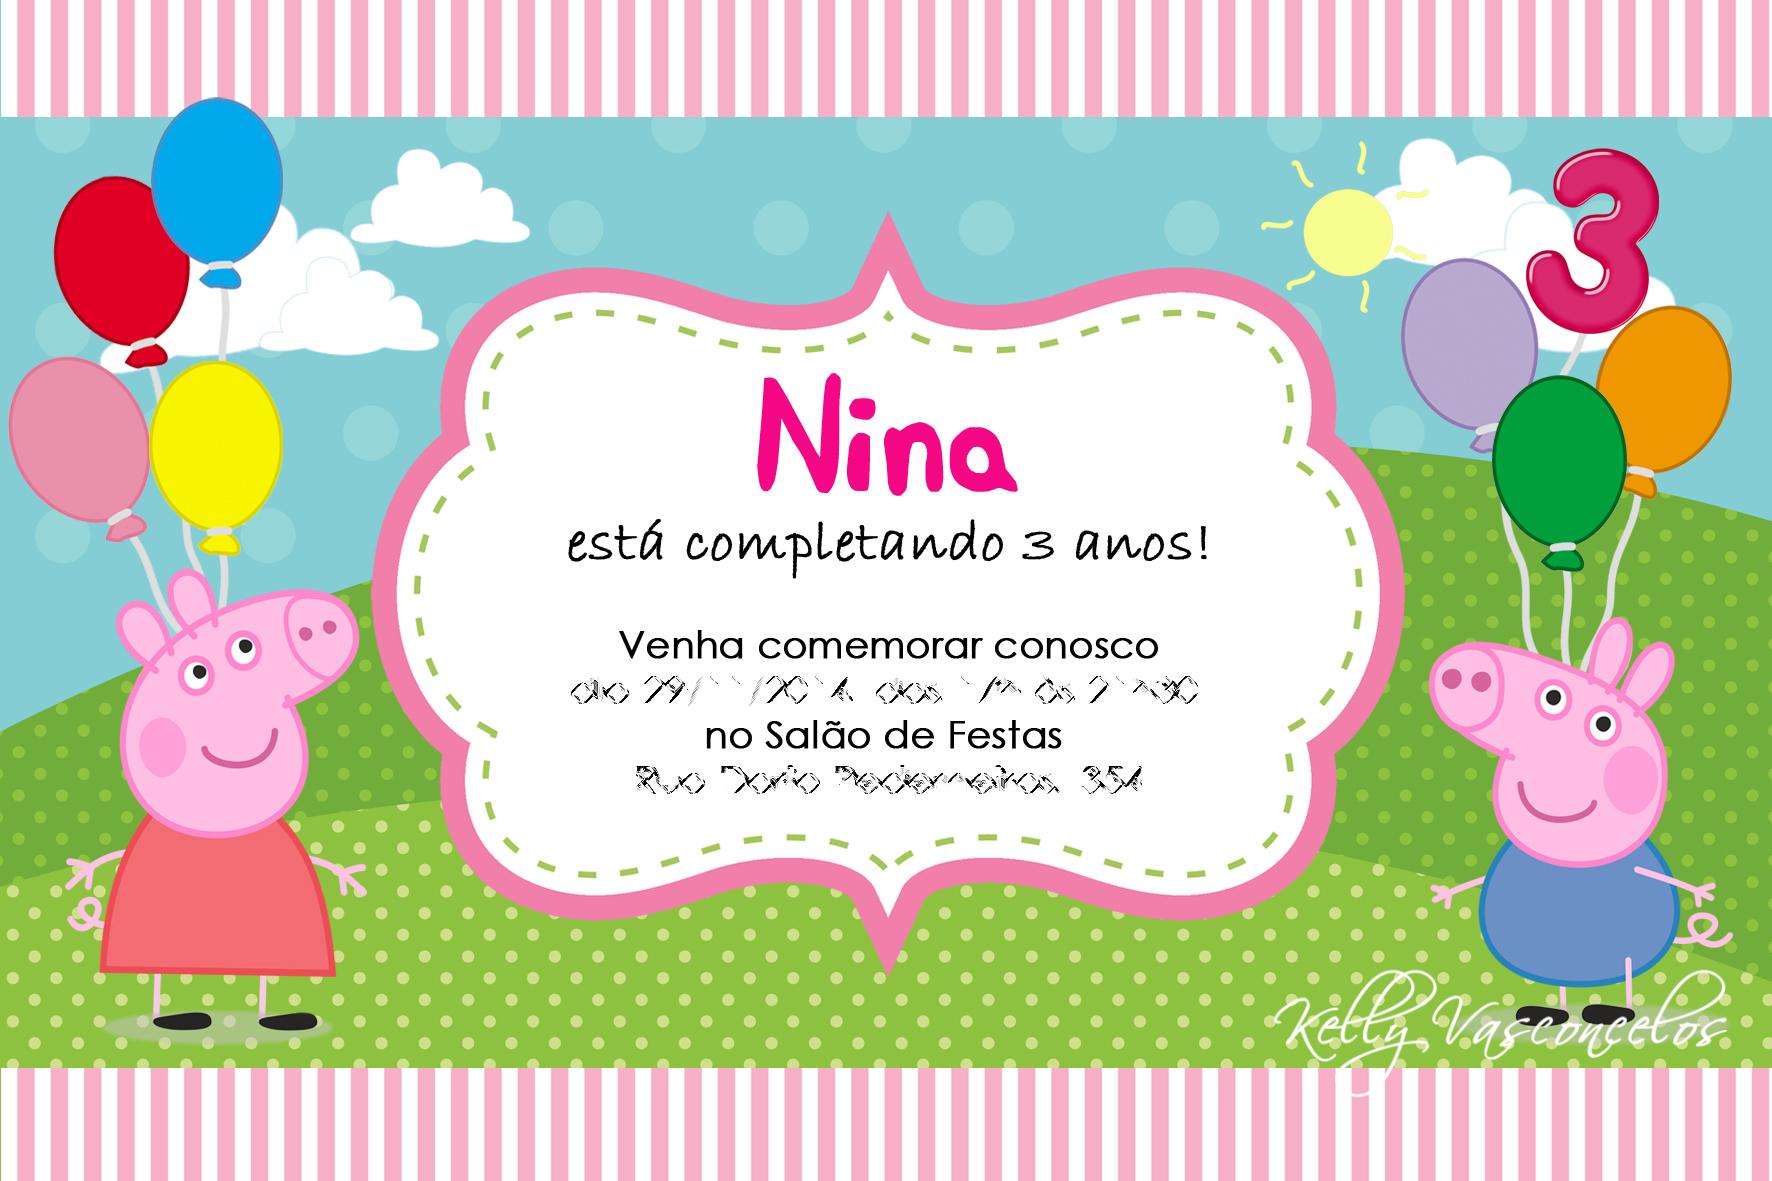 Convite Digital Peppa Pig No Elo7 Kelly Vasconcelos 444b17